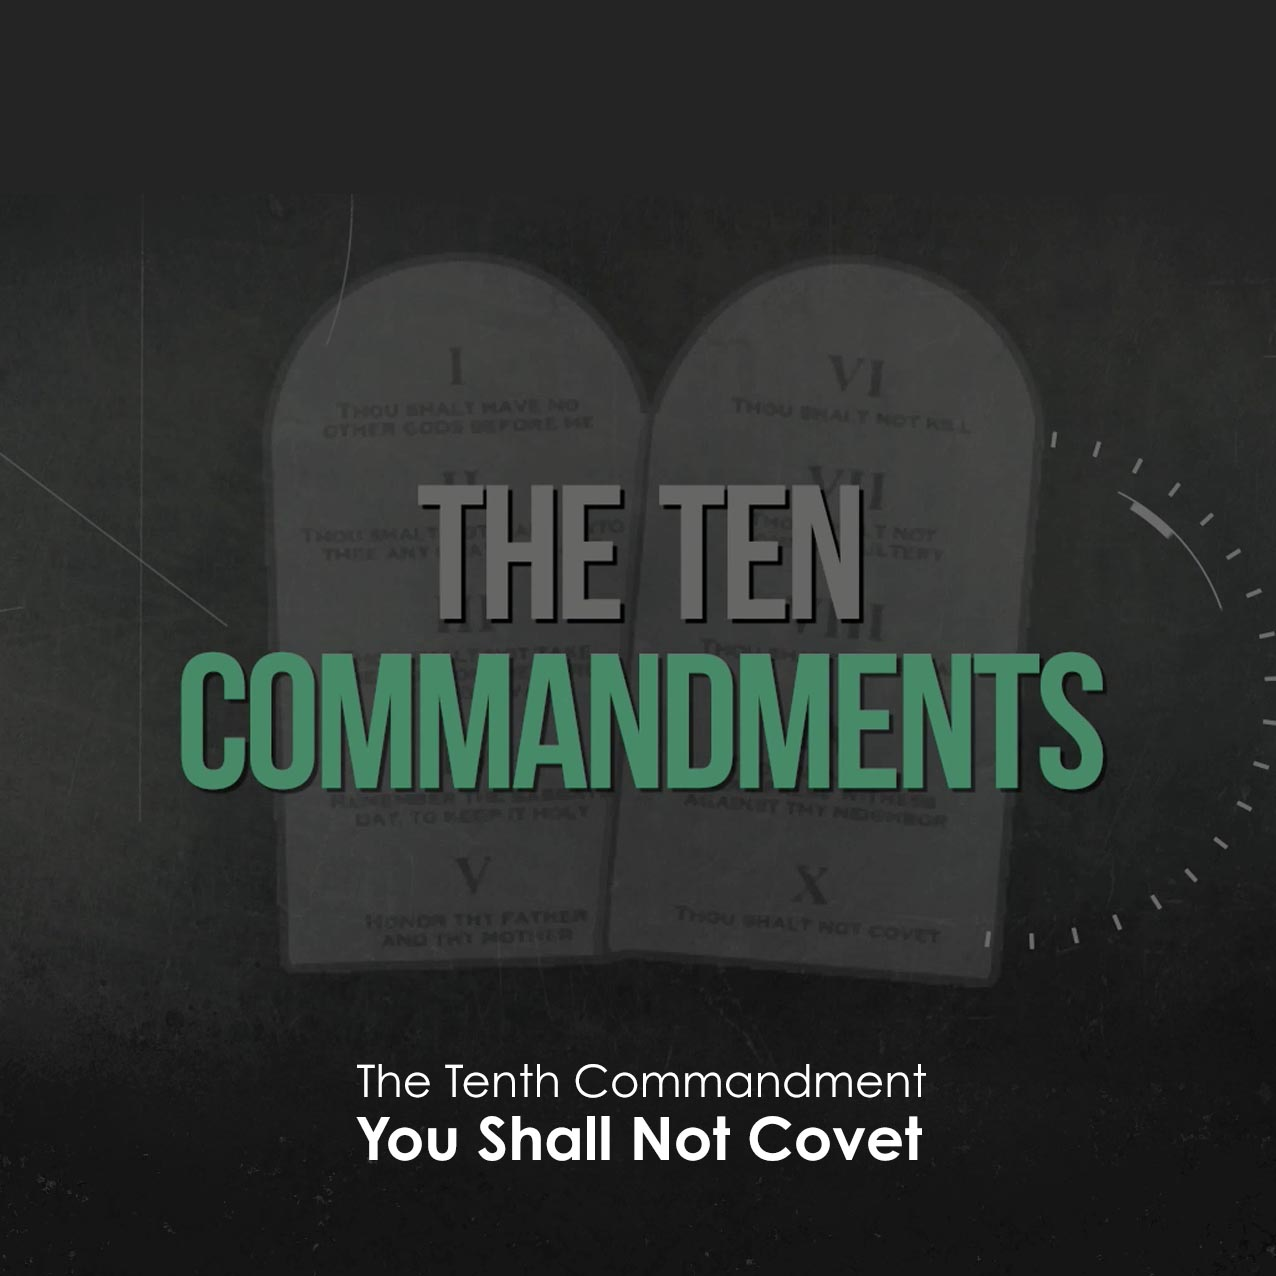 The Ten Commandments: You Shall Not Covet